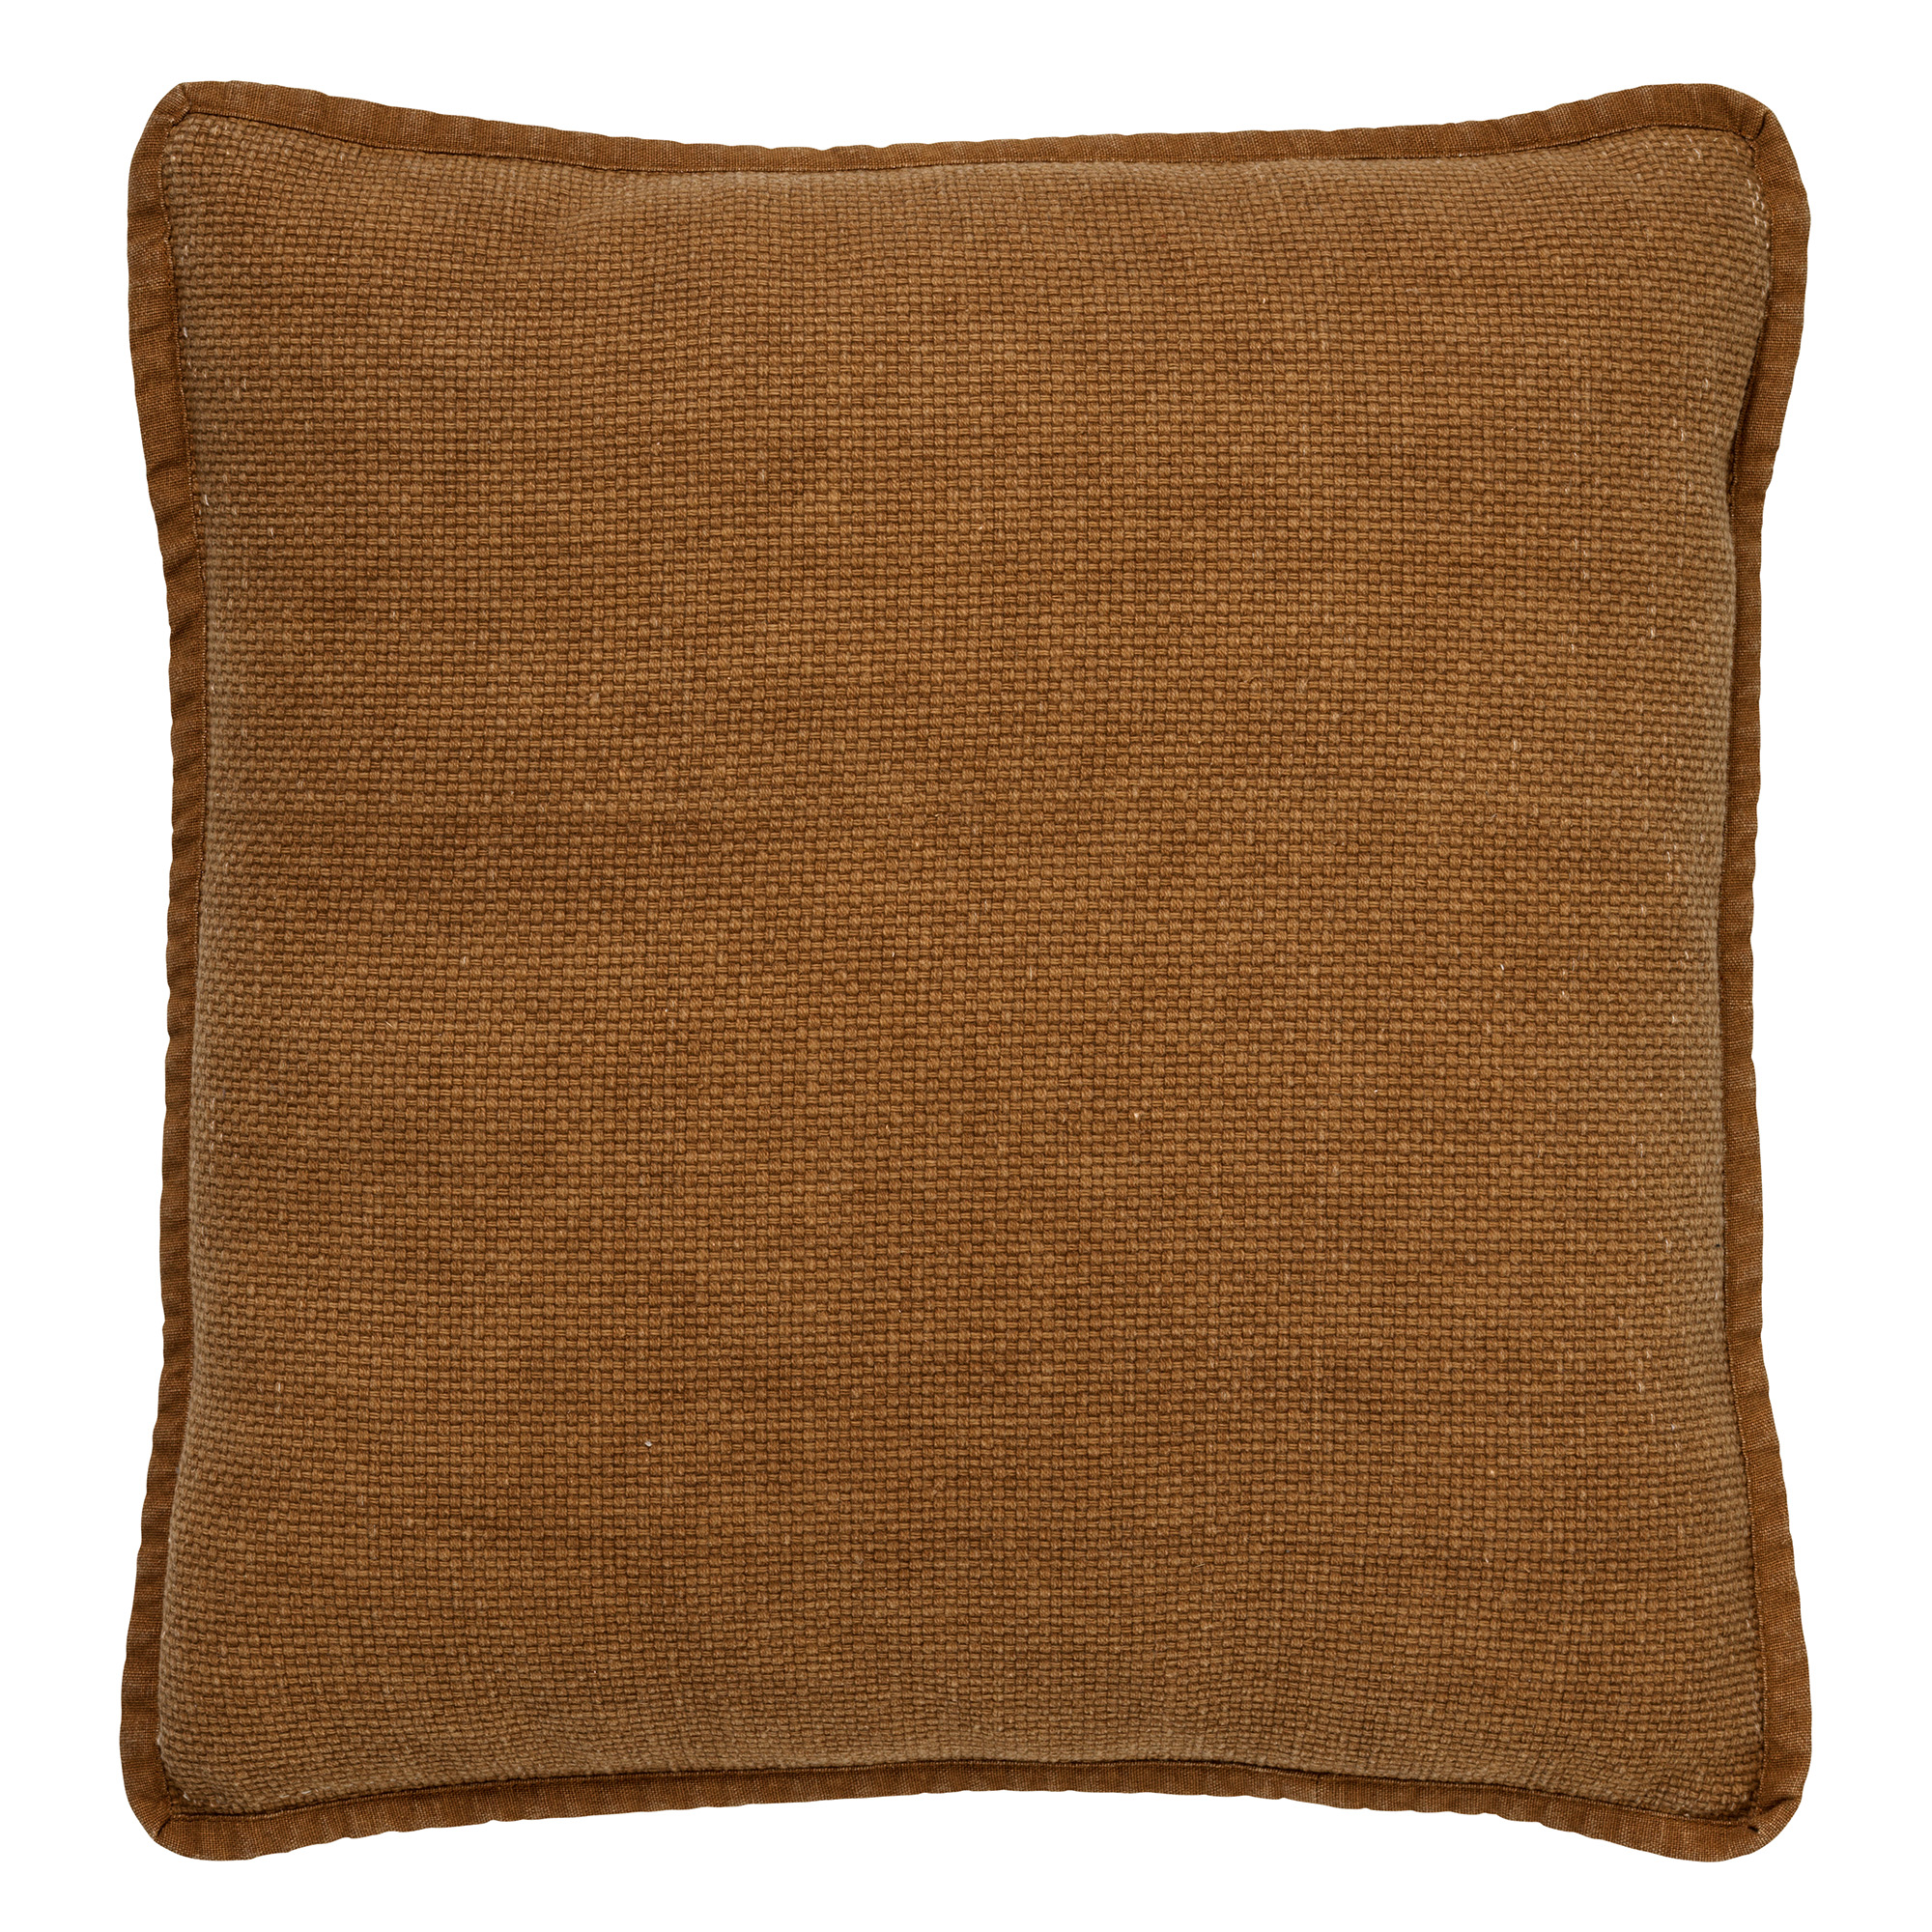 BOWIE - Sierkussen van katoen Tobacco Brown 45x45 cm